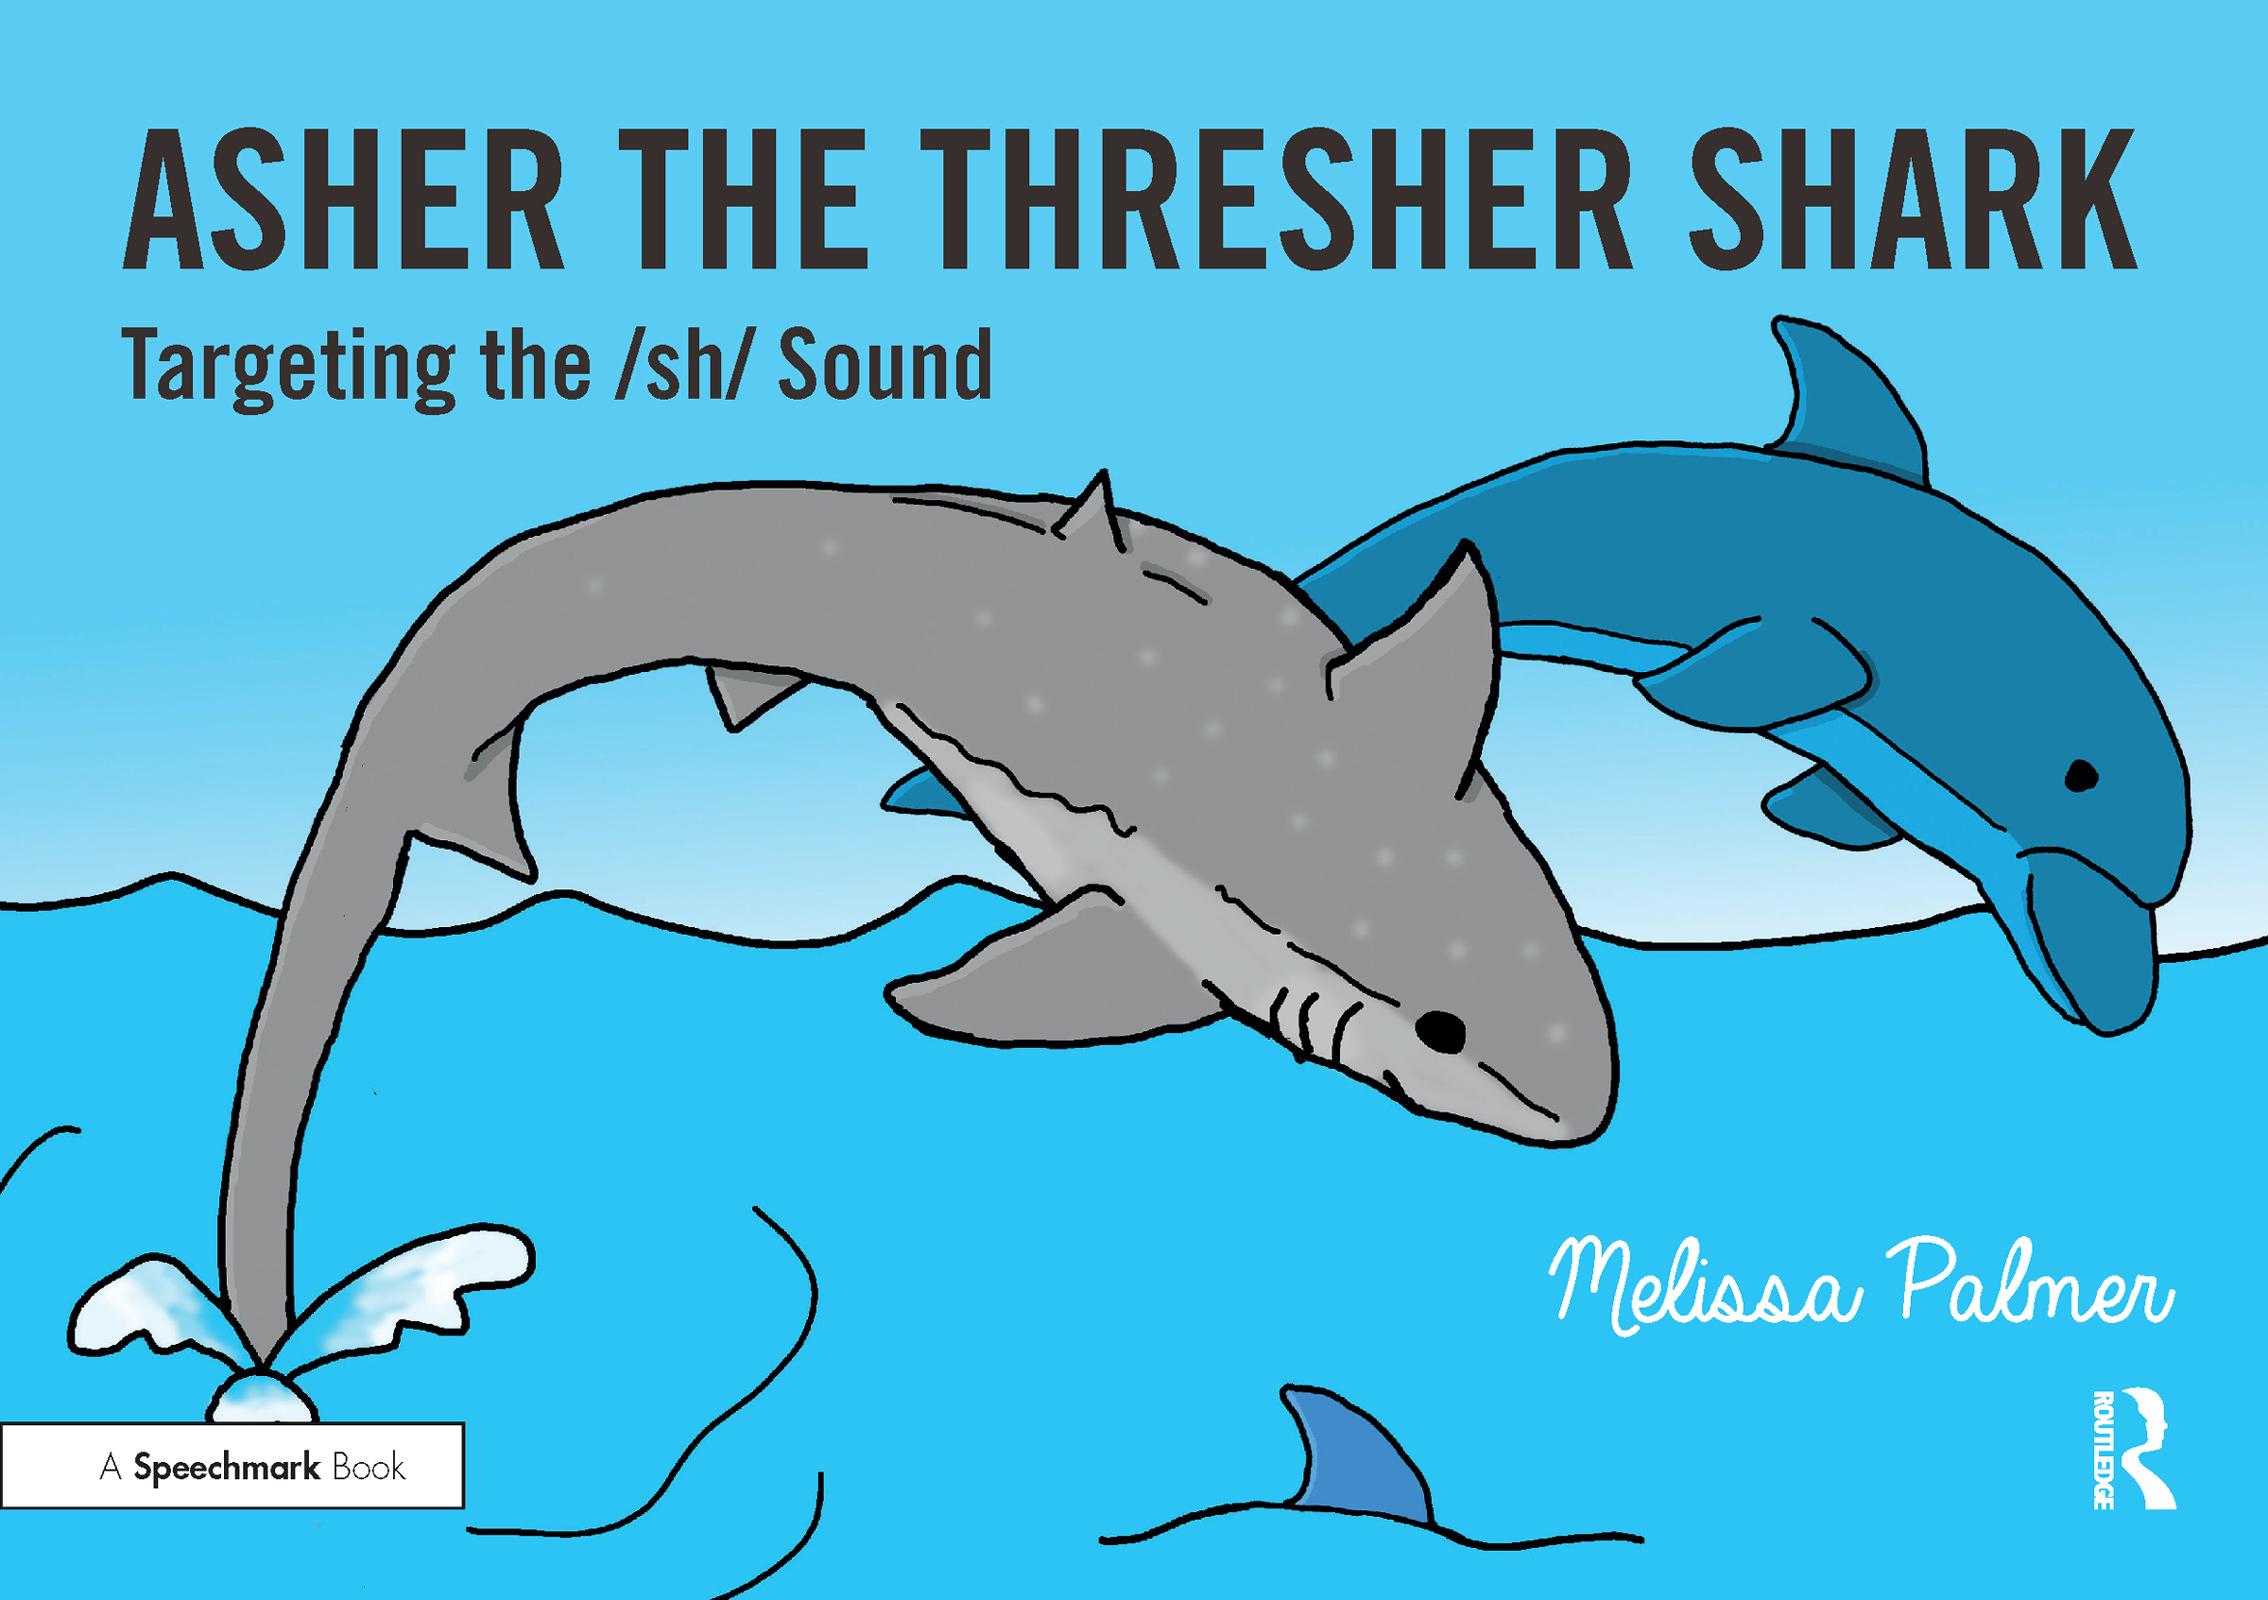 Asher the Thresher Shark